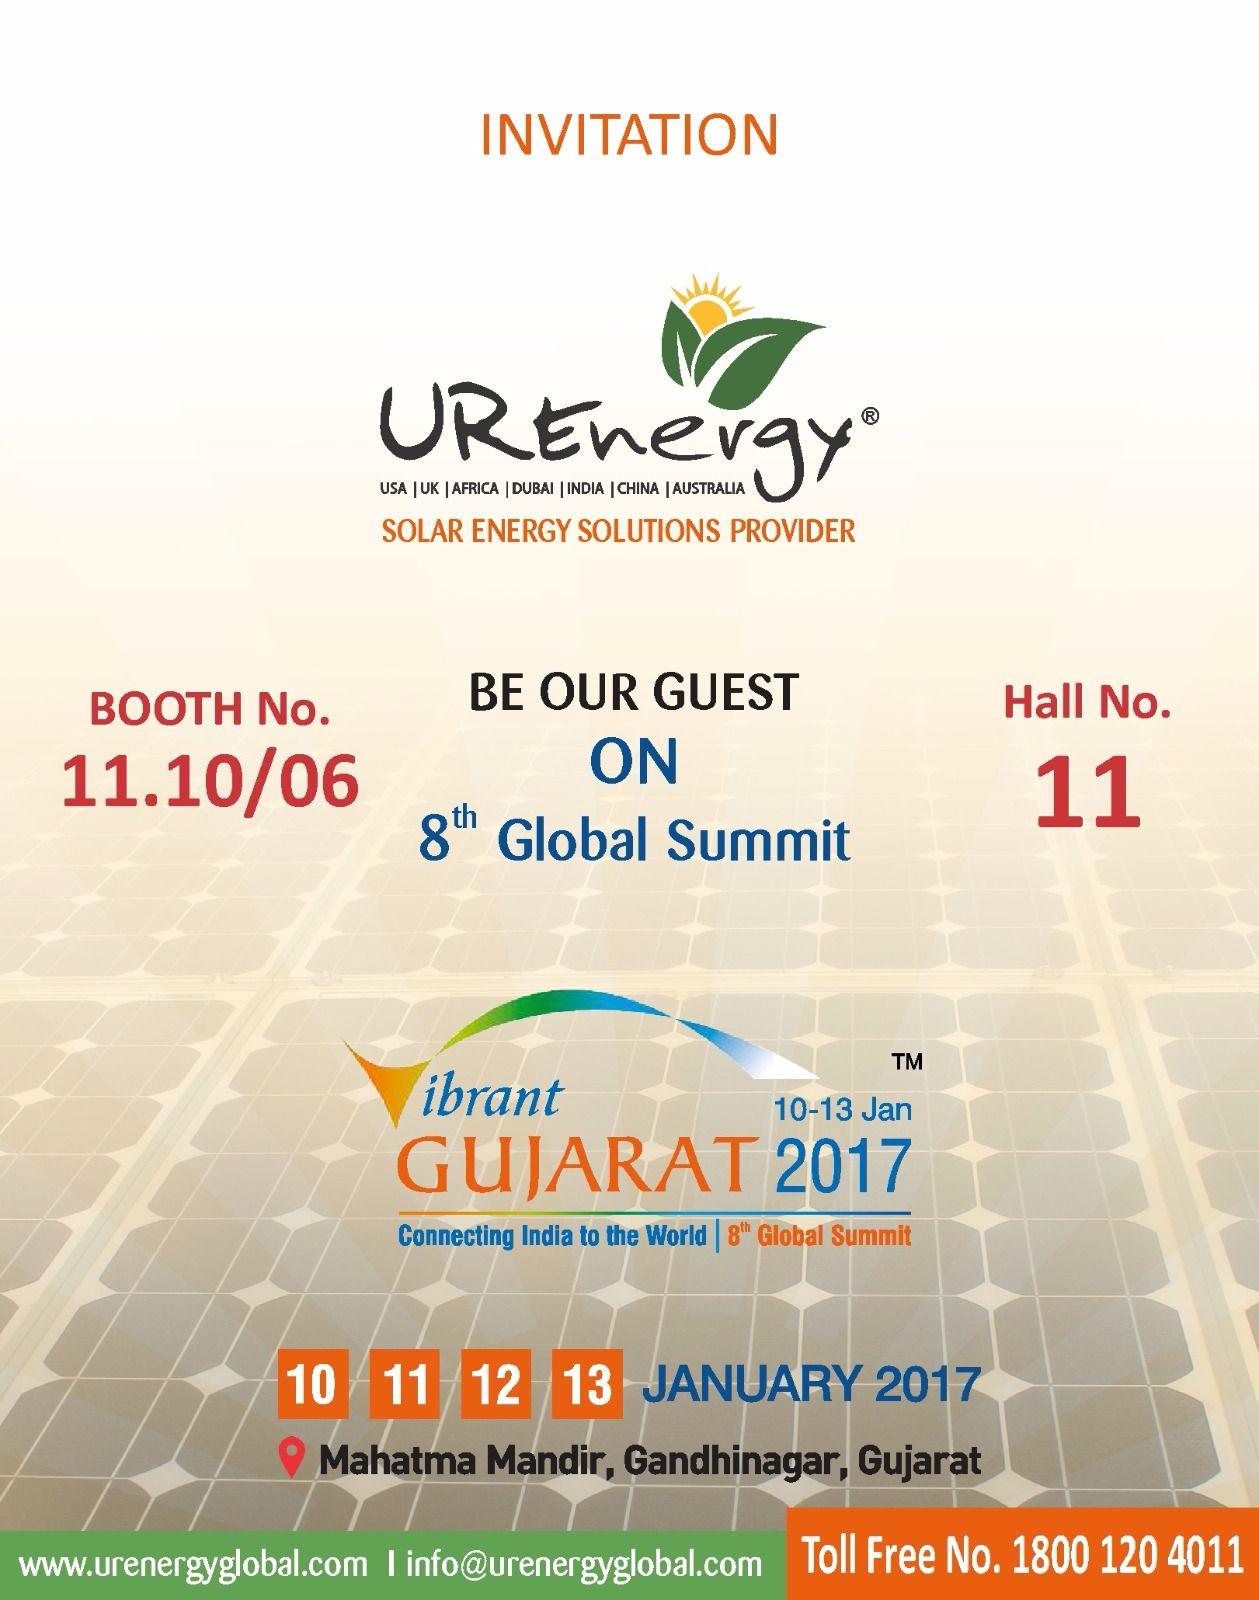 Rooftop Solar Panel Inverters Water Pump Solar Epc Gujarat India U R Energy Solar Energy Solutions Solar Water Pump Renewable Energy Companies